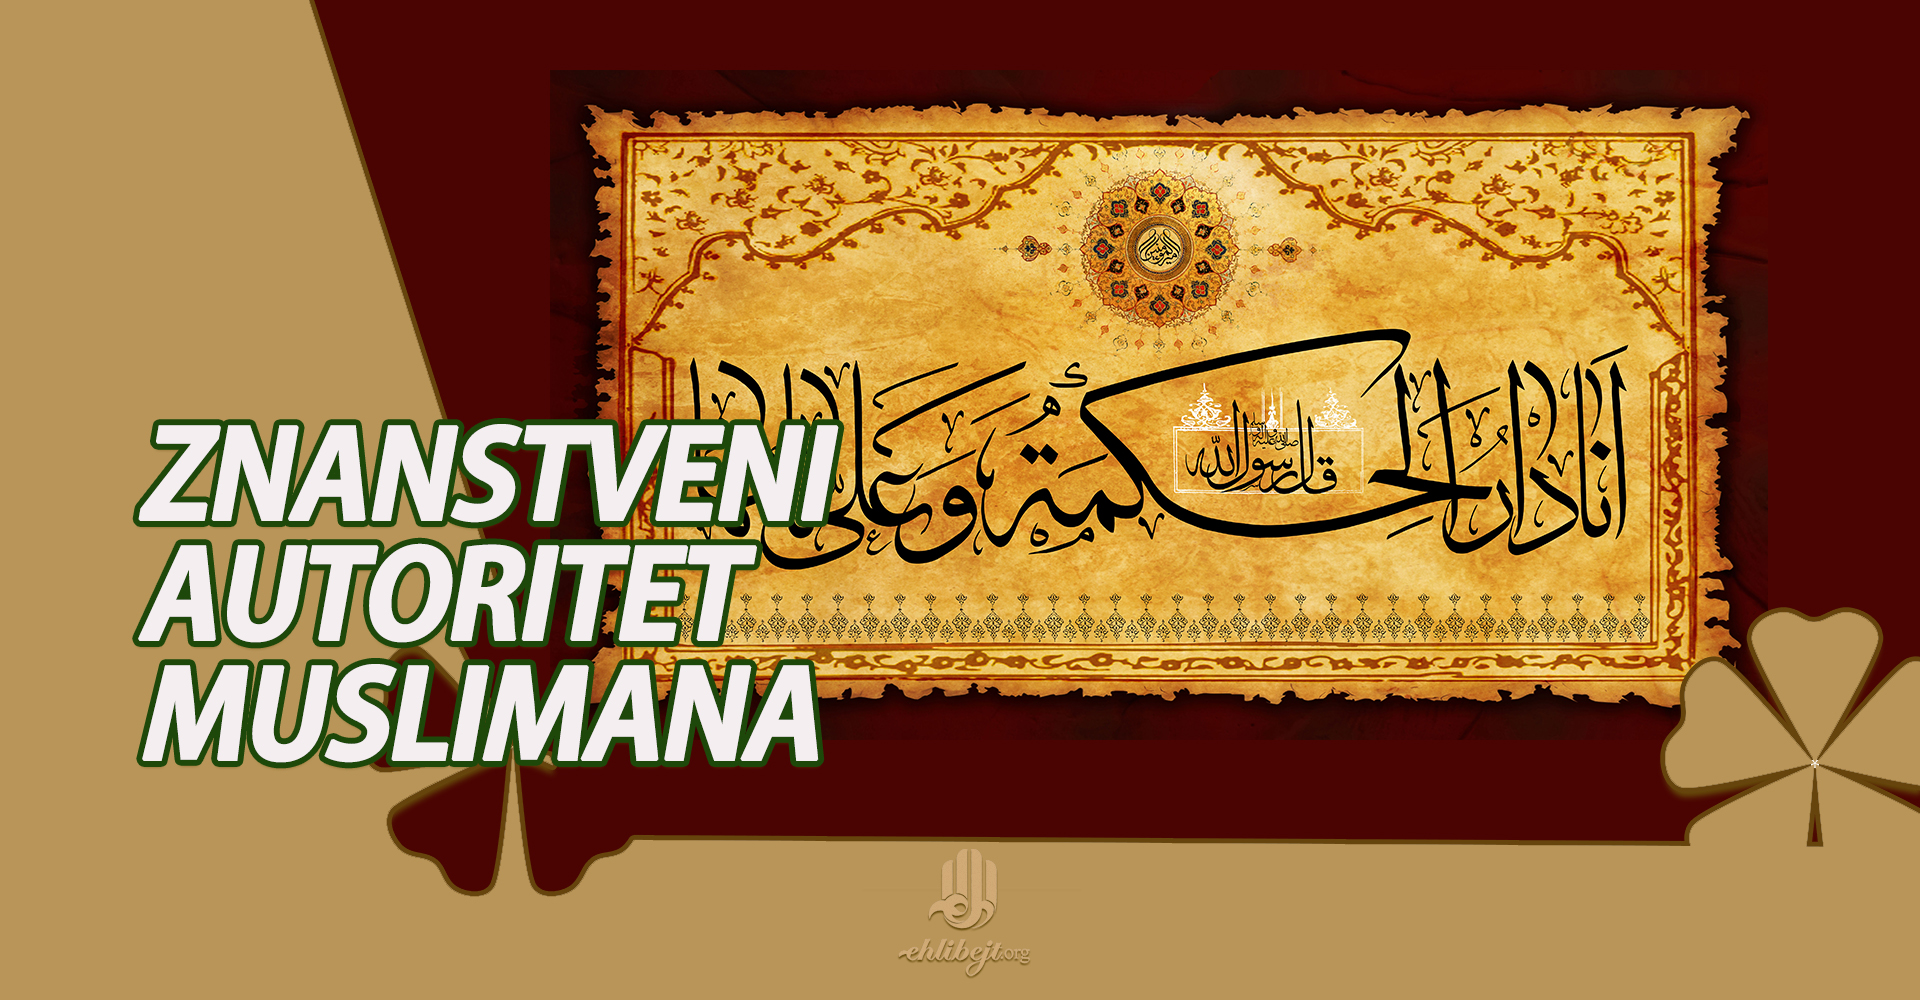 Znanstveni autoritet muslimana